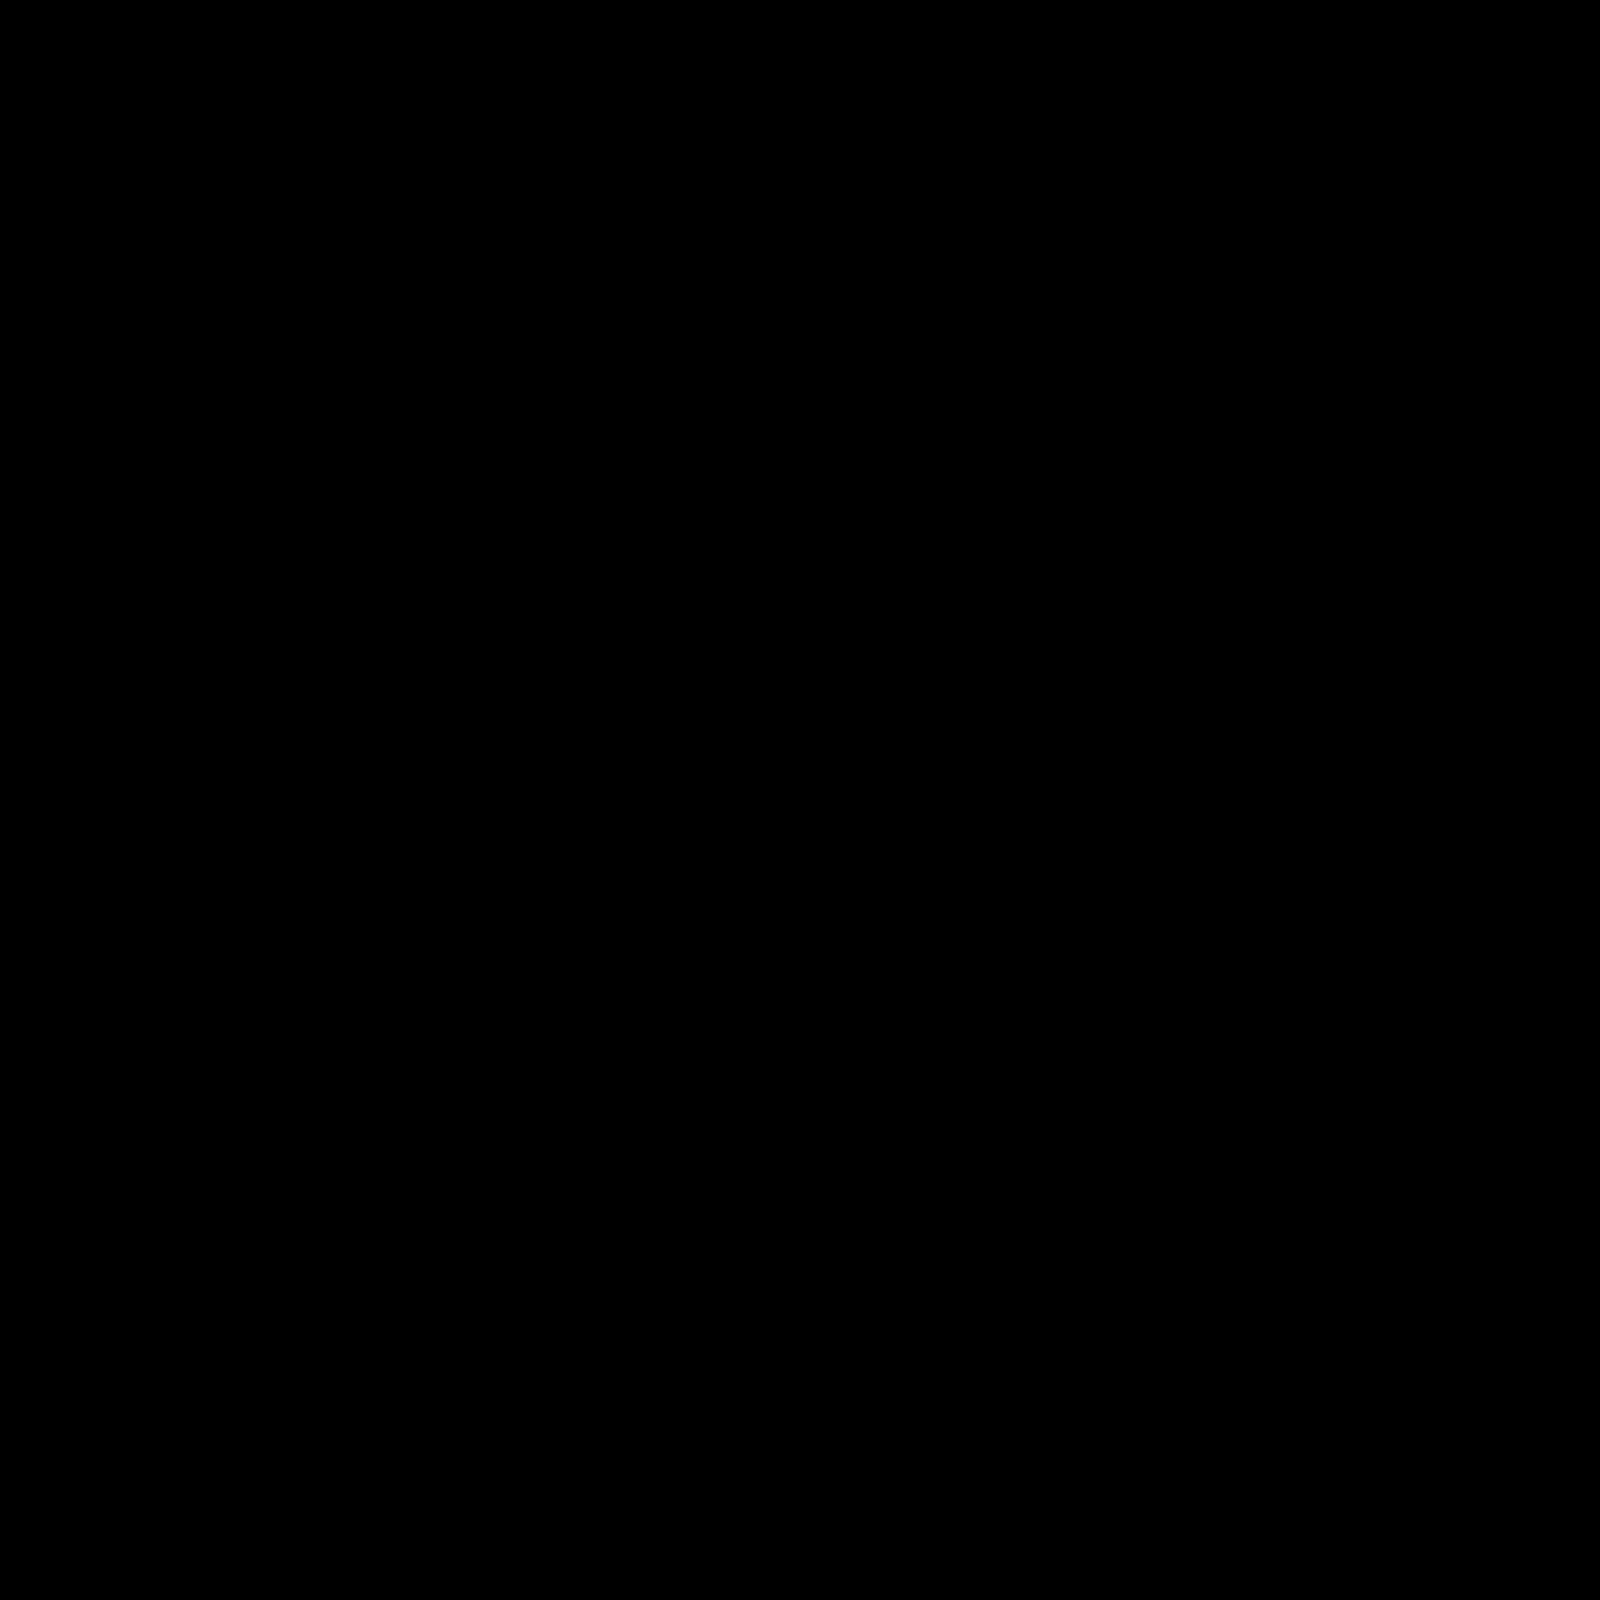 Whip clipart vector. Milkshake icon free download